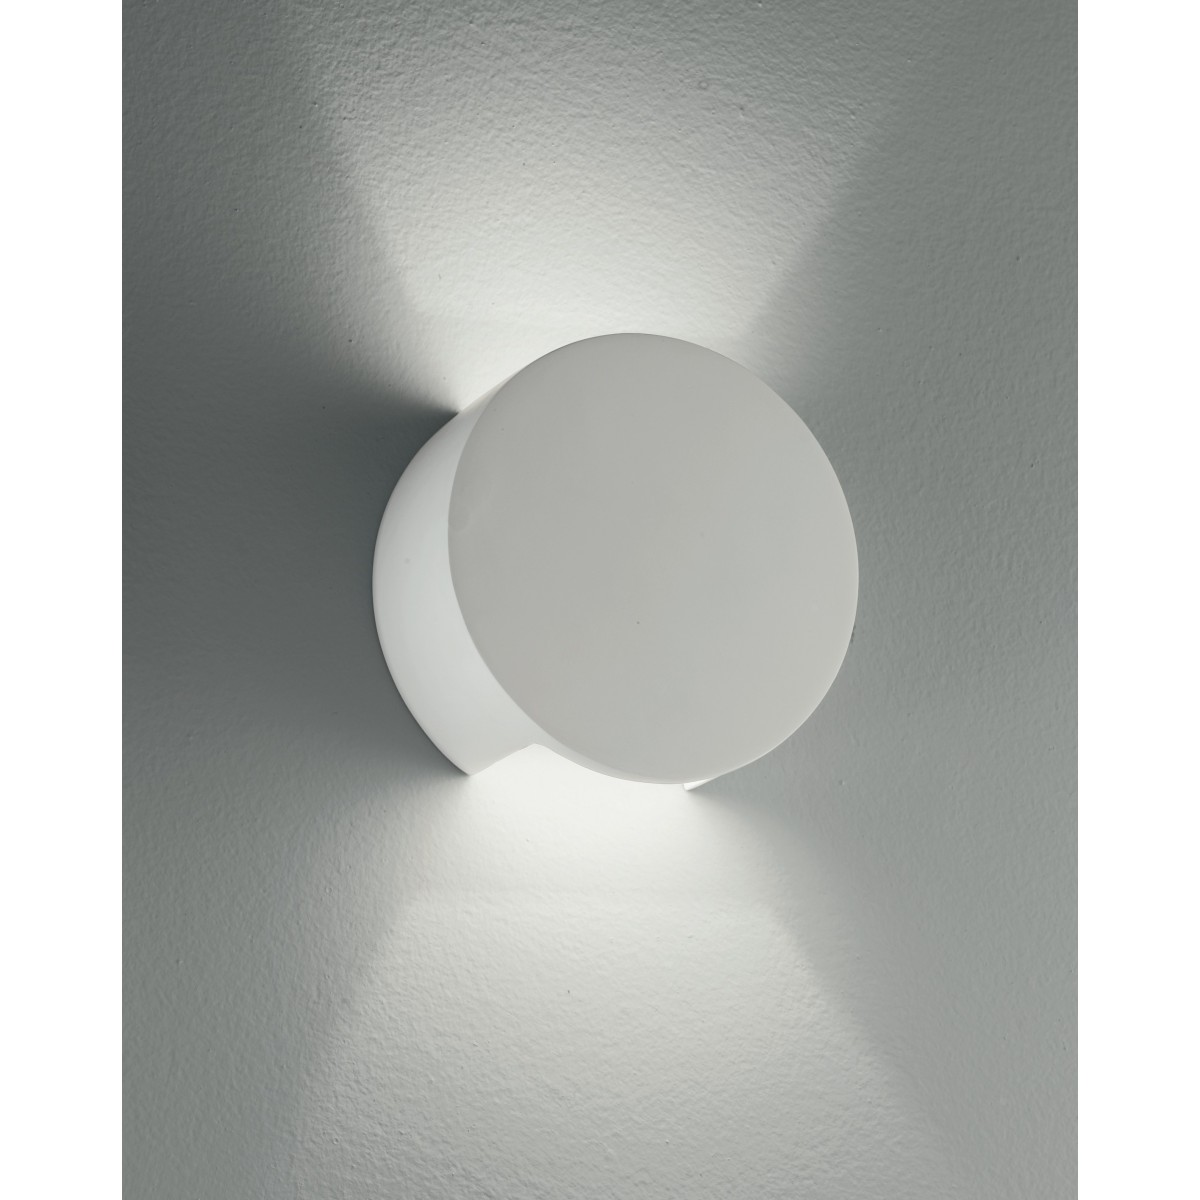 I-LEIRON-AP - Applique Paintable Plaster Round Double Diffusion of Light Applique G9